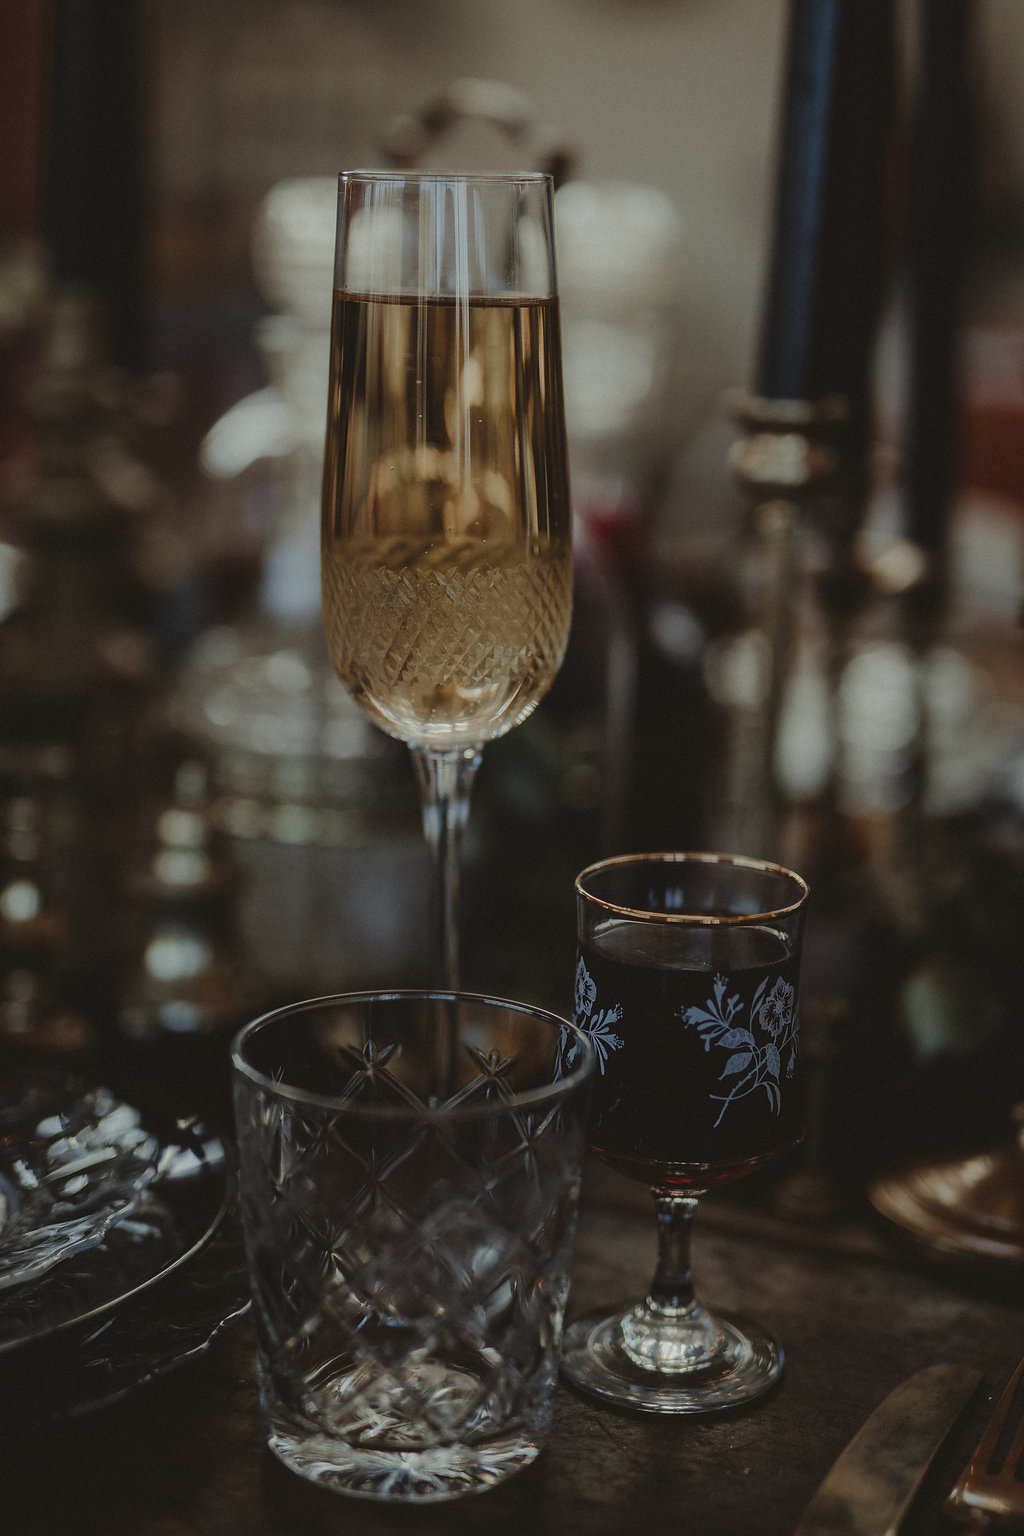 Studio Fotografico Bacci - Steampunk wedding - alternative wedding 67